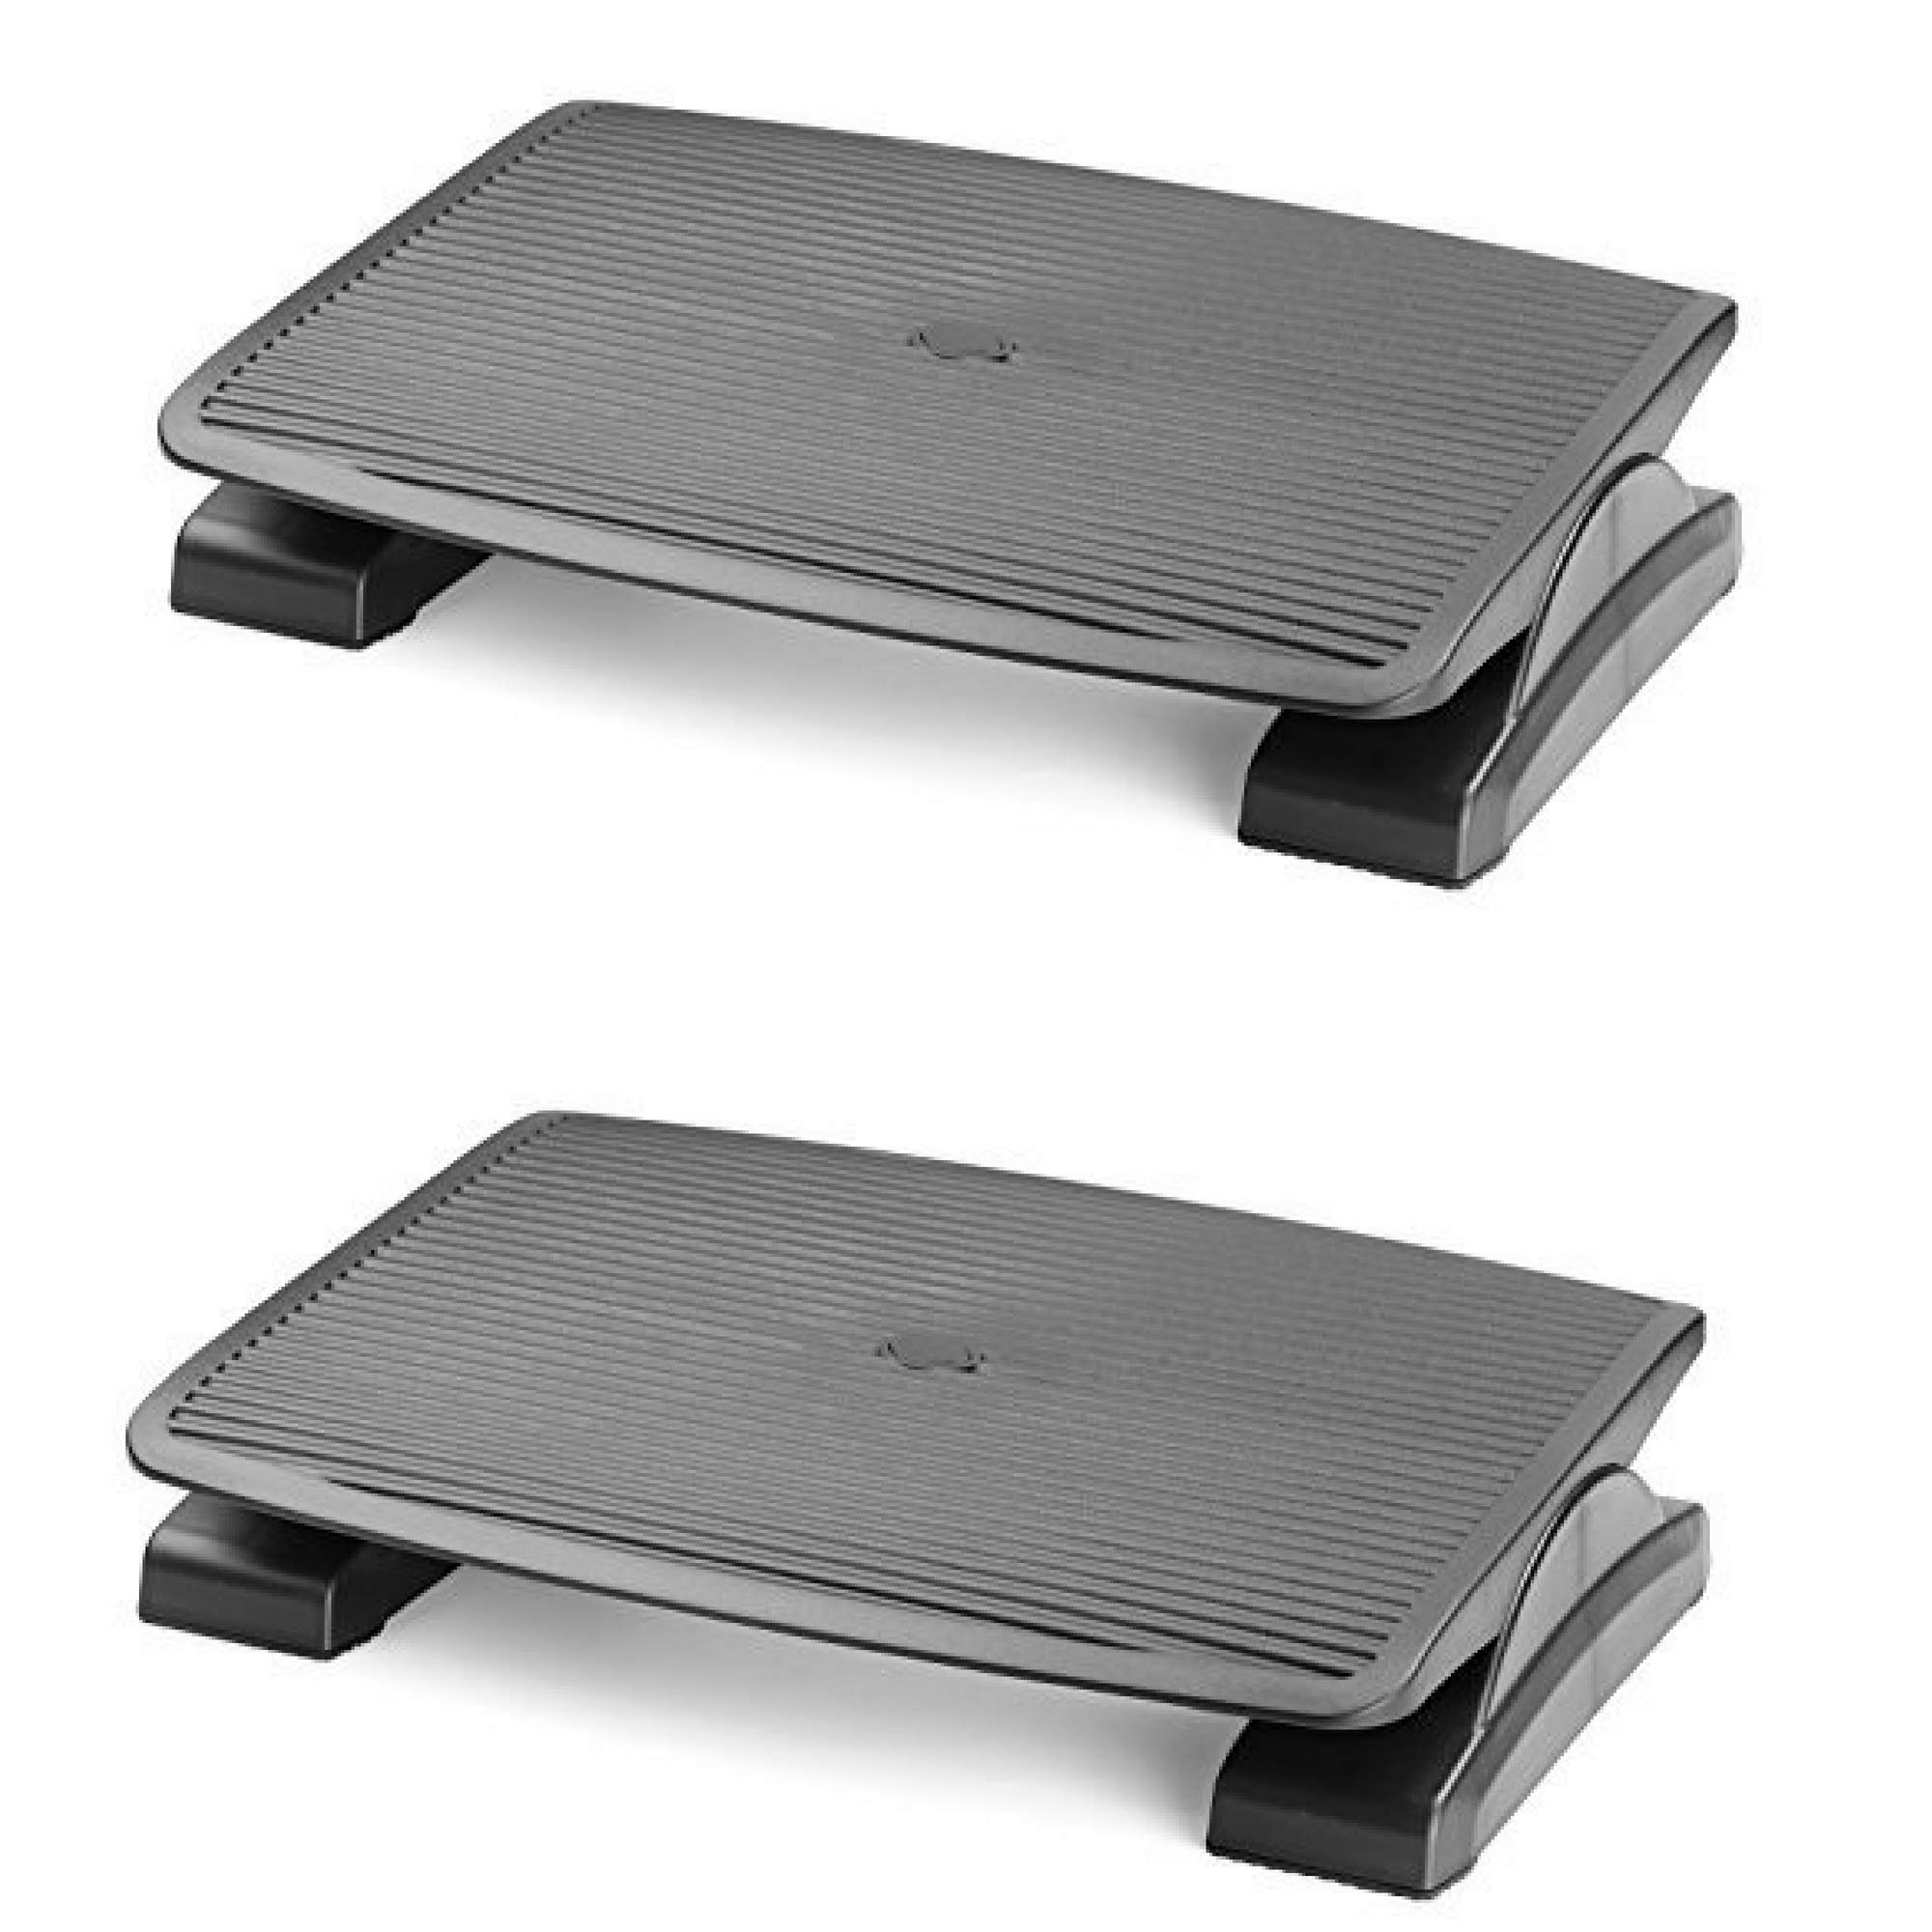 Under Desk Foot Rest, Black Footstool & Office Footrest, Adjustable Angle Positions 13.8'' X 17.7'' - Great for Home & Work - 2 Pack